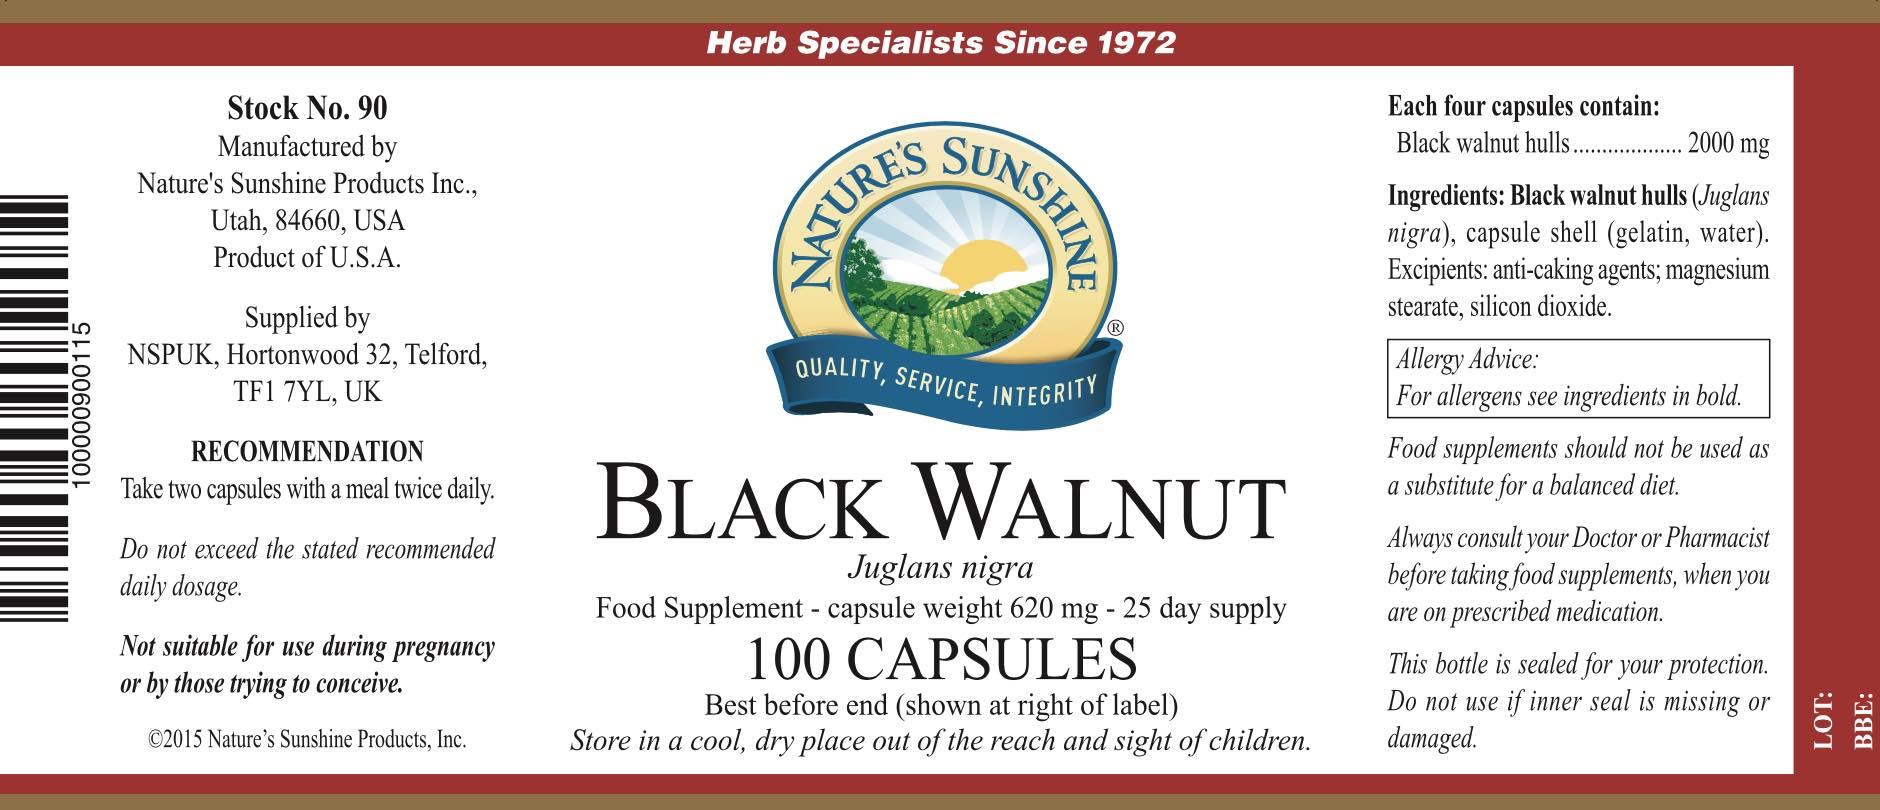 Nature's Sunshine - Black Walnut (100 Capsules) - Label